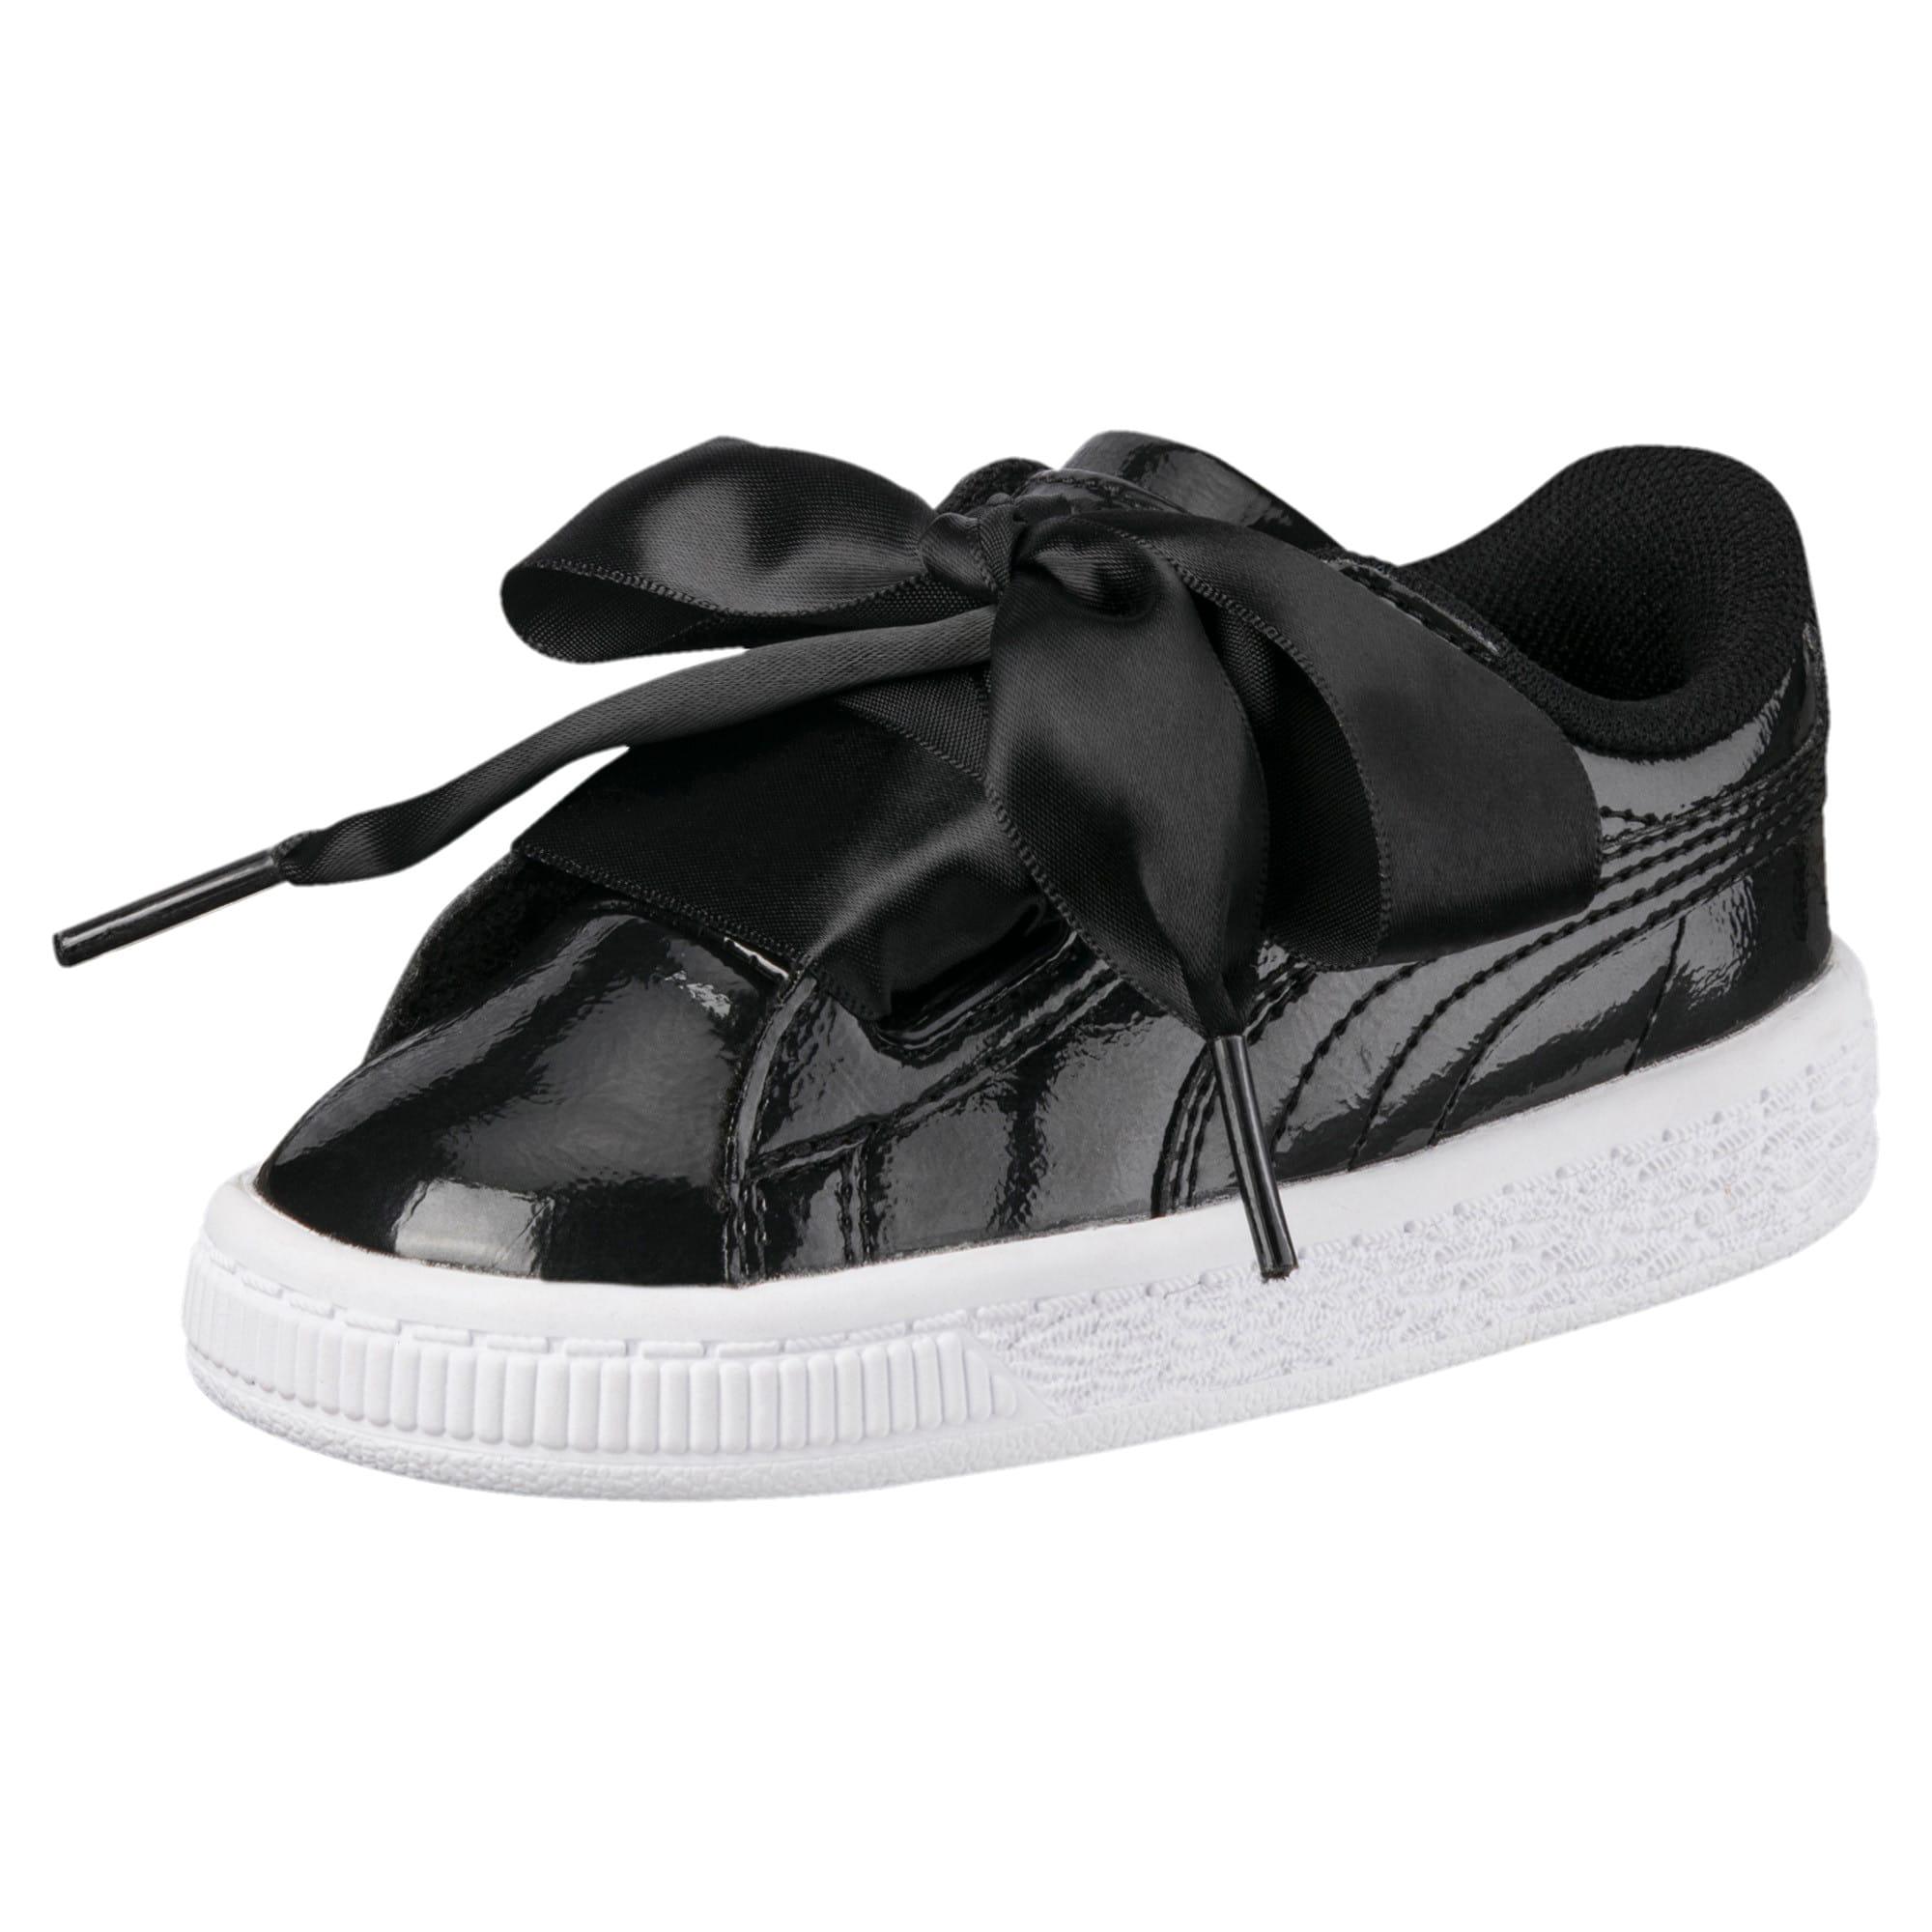 Thumbnail 1 of Basket Heart Glam Girls' Shoes, Puma Black-Puma Black, medium